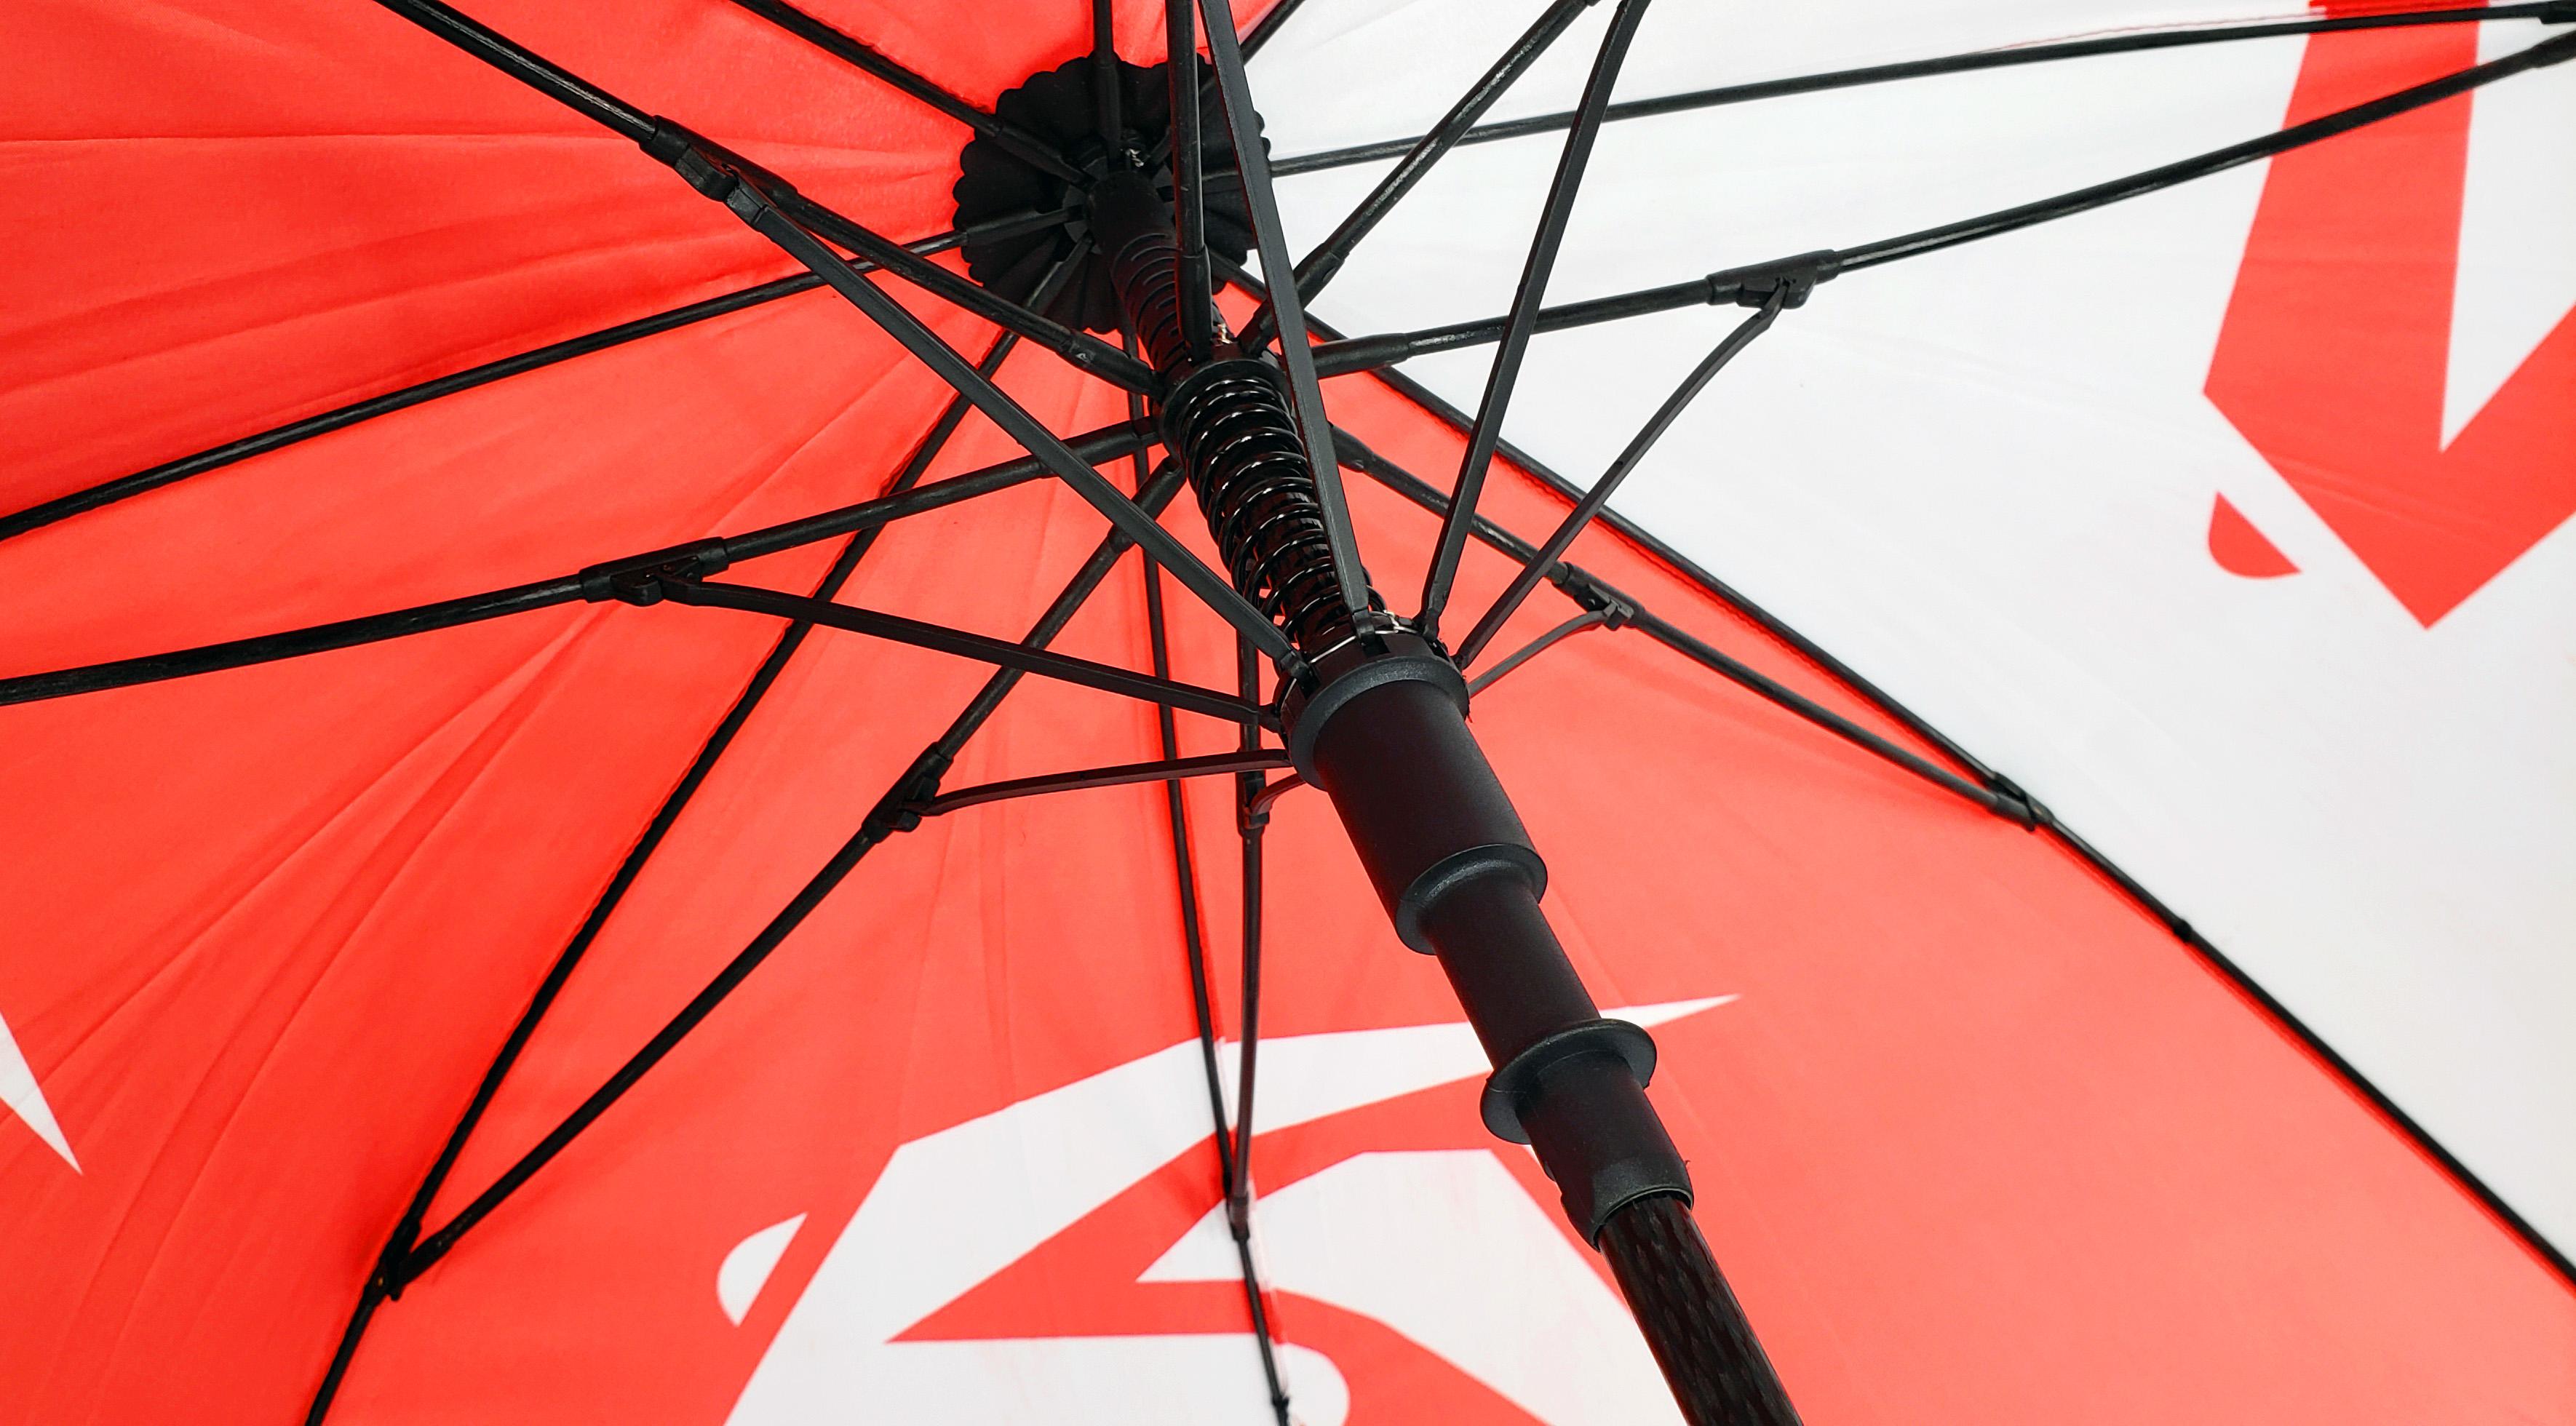 Risk Racing Motocross Umbrella Auto Open Frame Structure